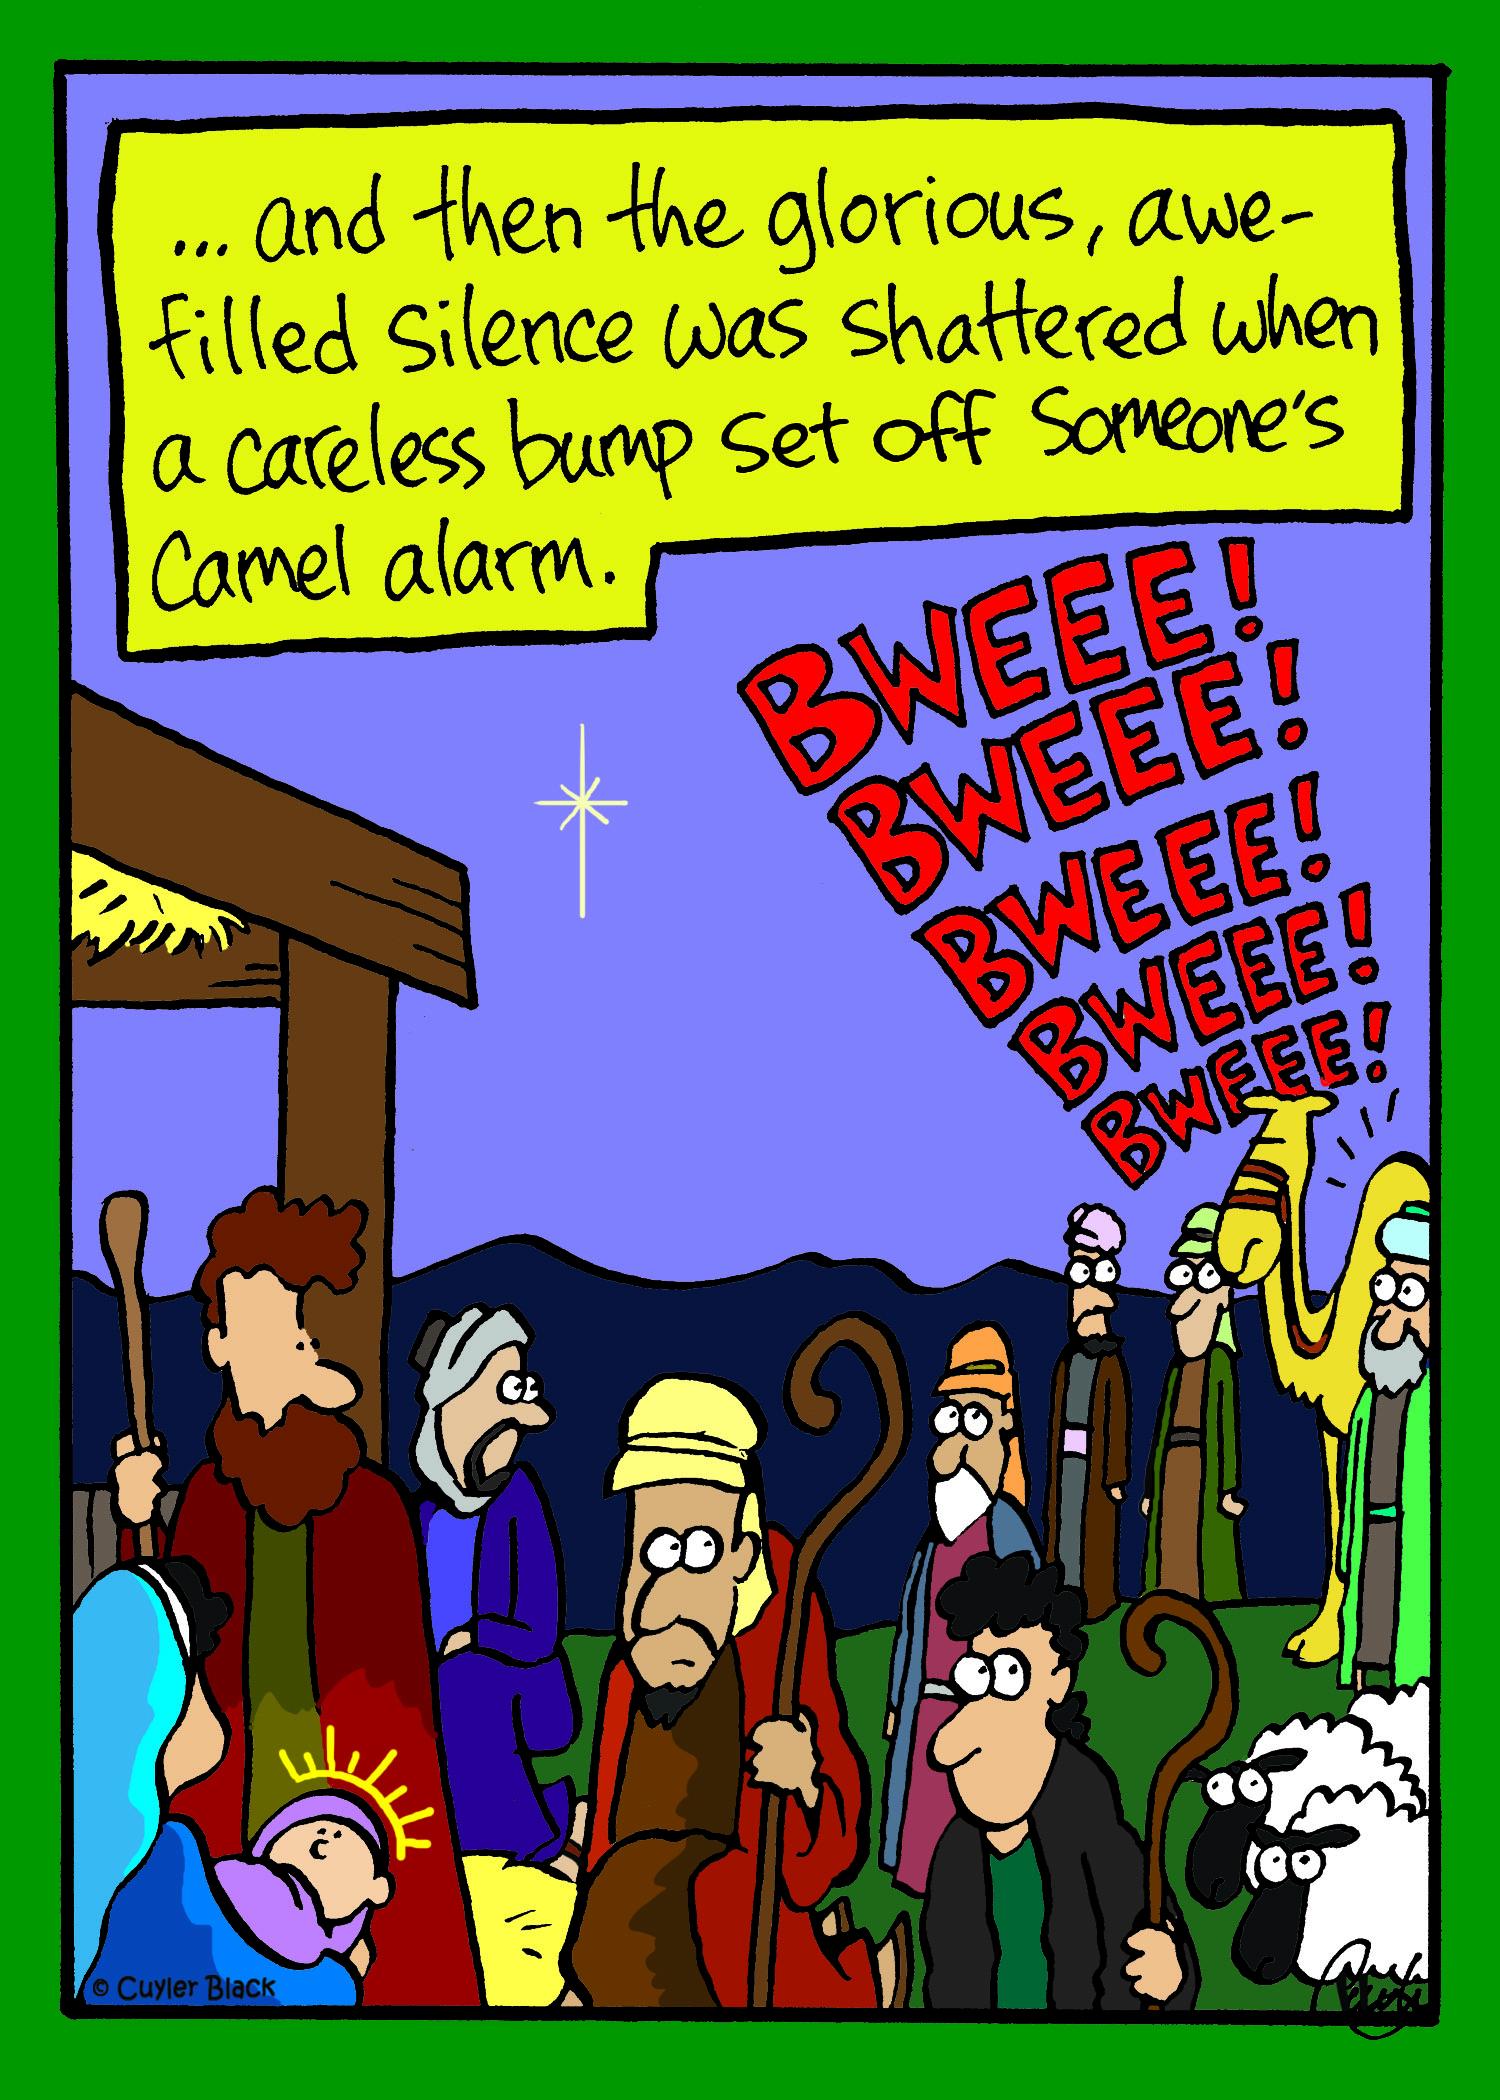 camel alarm.jpg